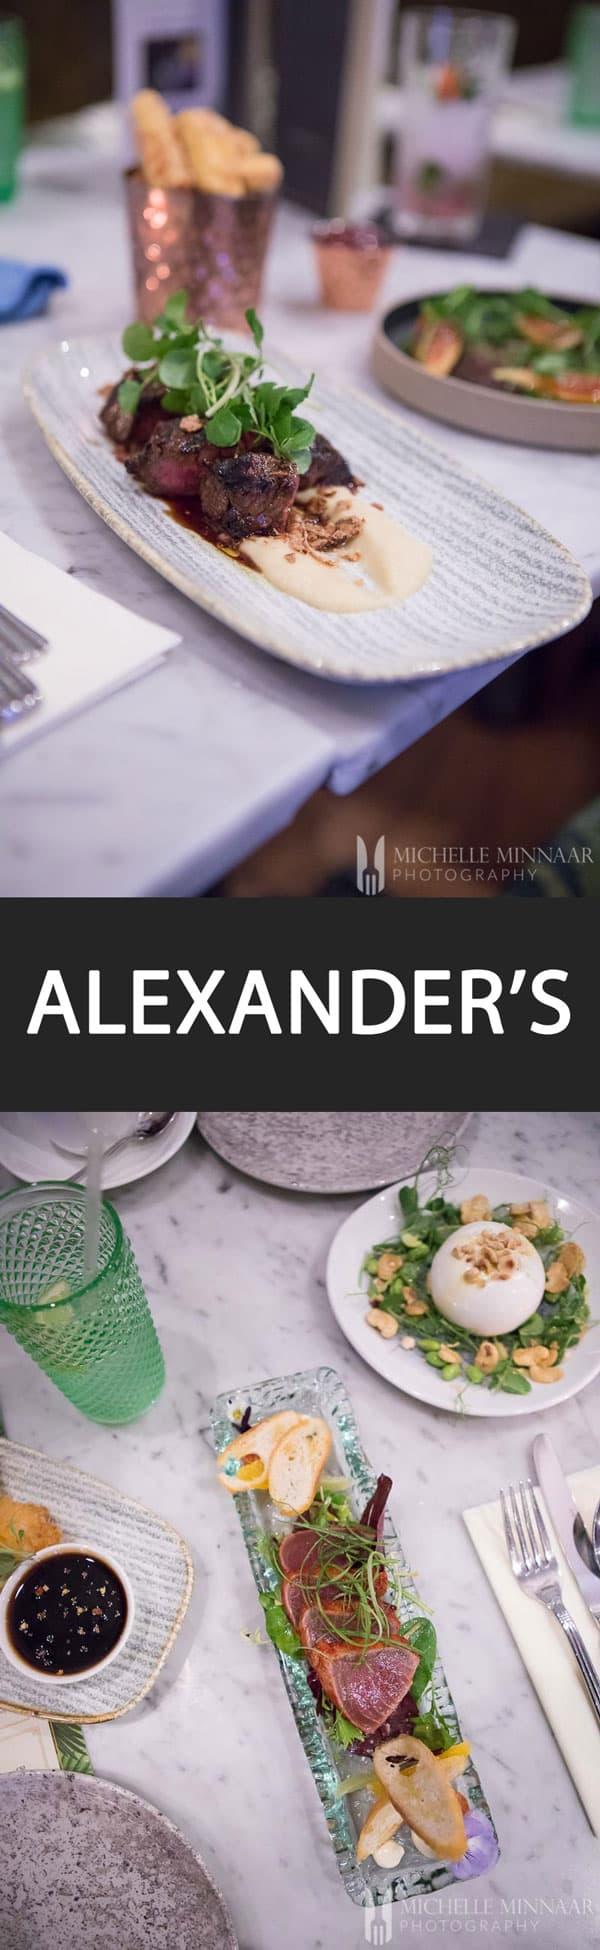 Pin Alexanders